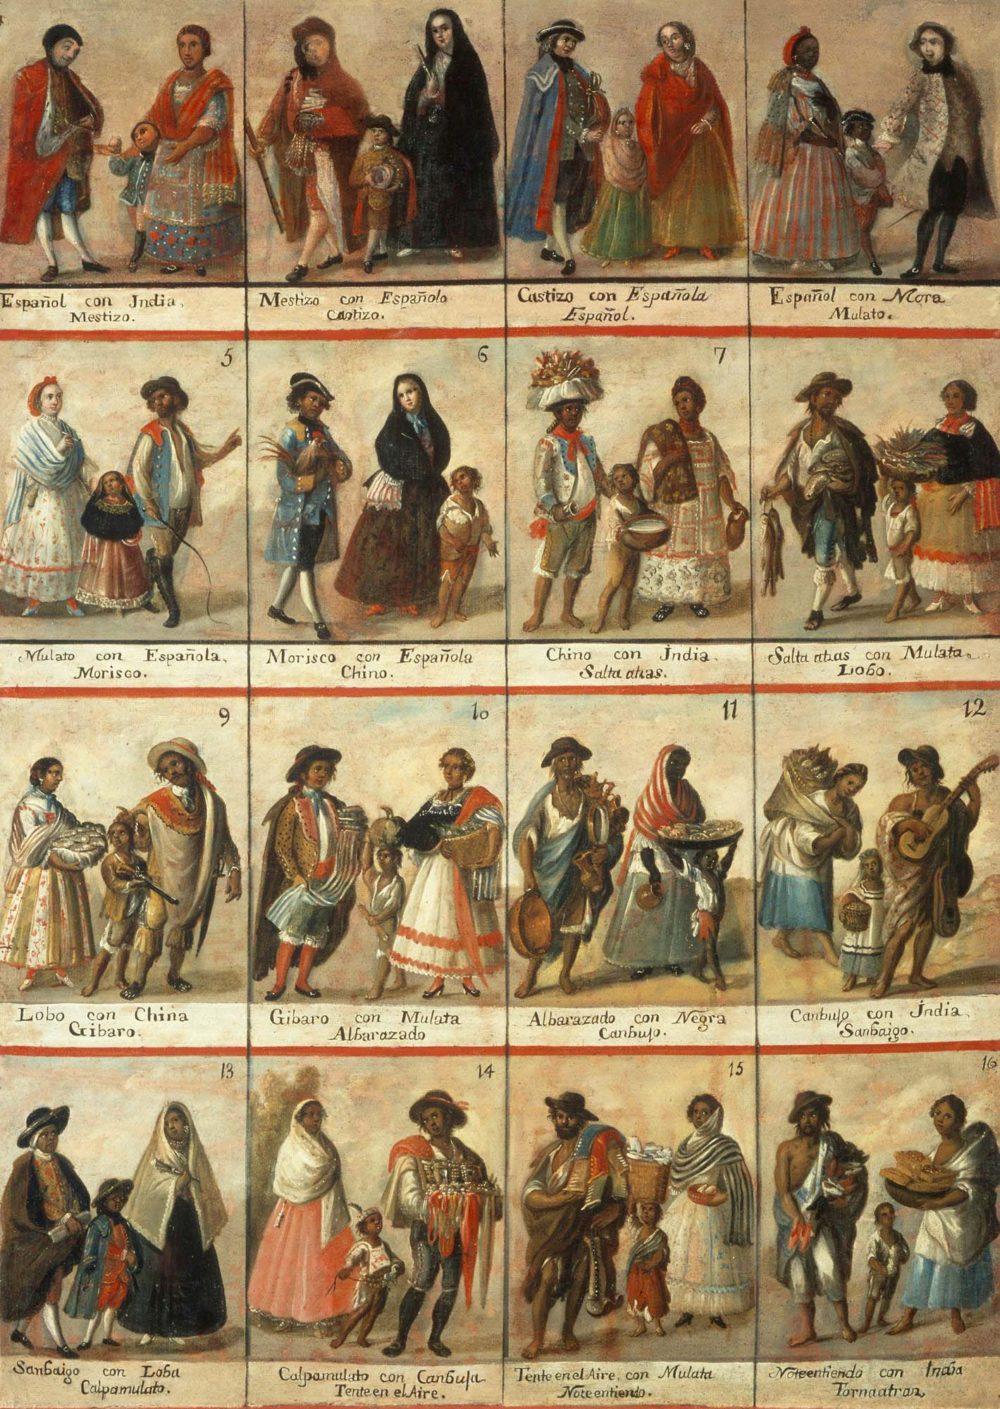 Excerpt from the casta paintings describing the many different races of Spanish America. The castas depicted are Mestizo, Castizo, Espanol, Mulato, Morisco, Chino, Salta atras, Lobo, Cribaro, Albarazado, Canbuso, Sanbaigo, Capamulato, Tenteen el Aire, Noteentiendo, Tornatraz